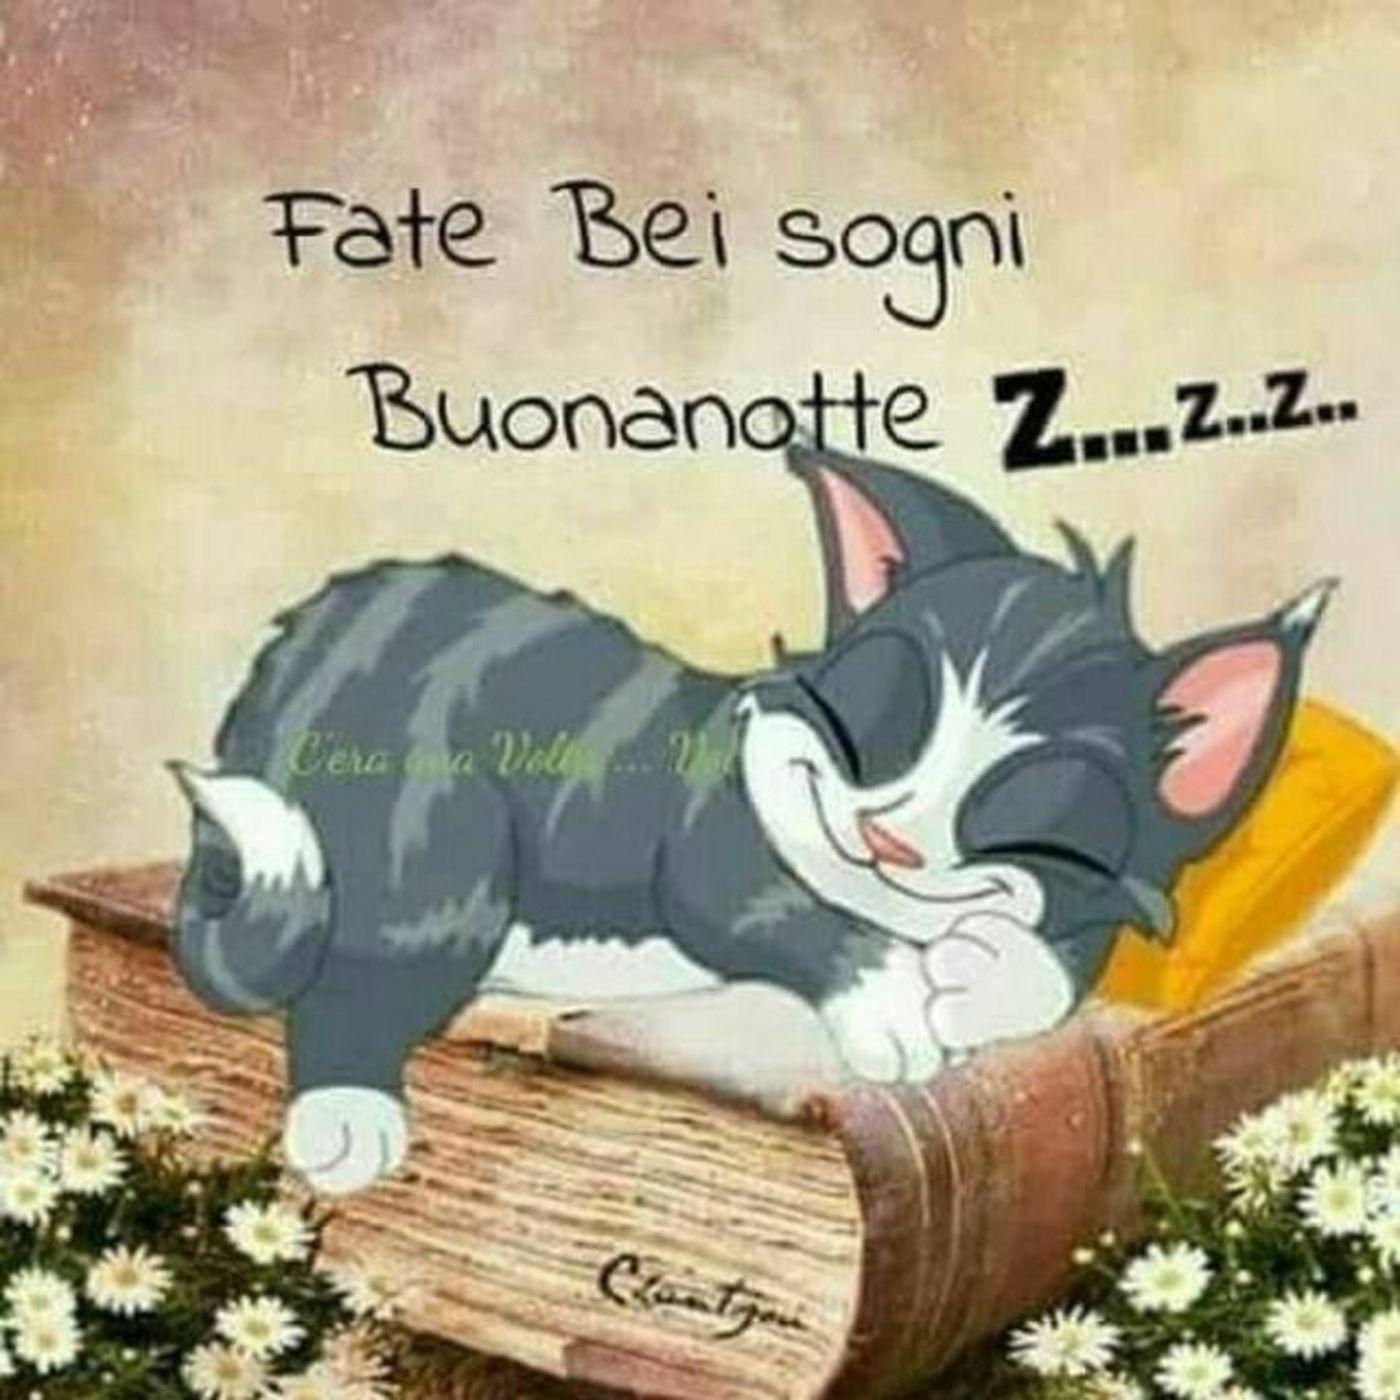 Buonanotte Belle Frasi Buongiornissimocaffeit